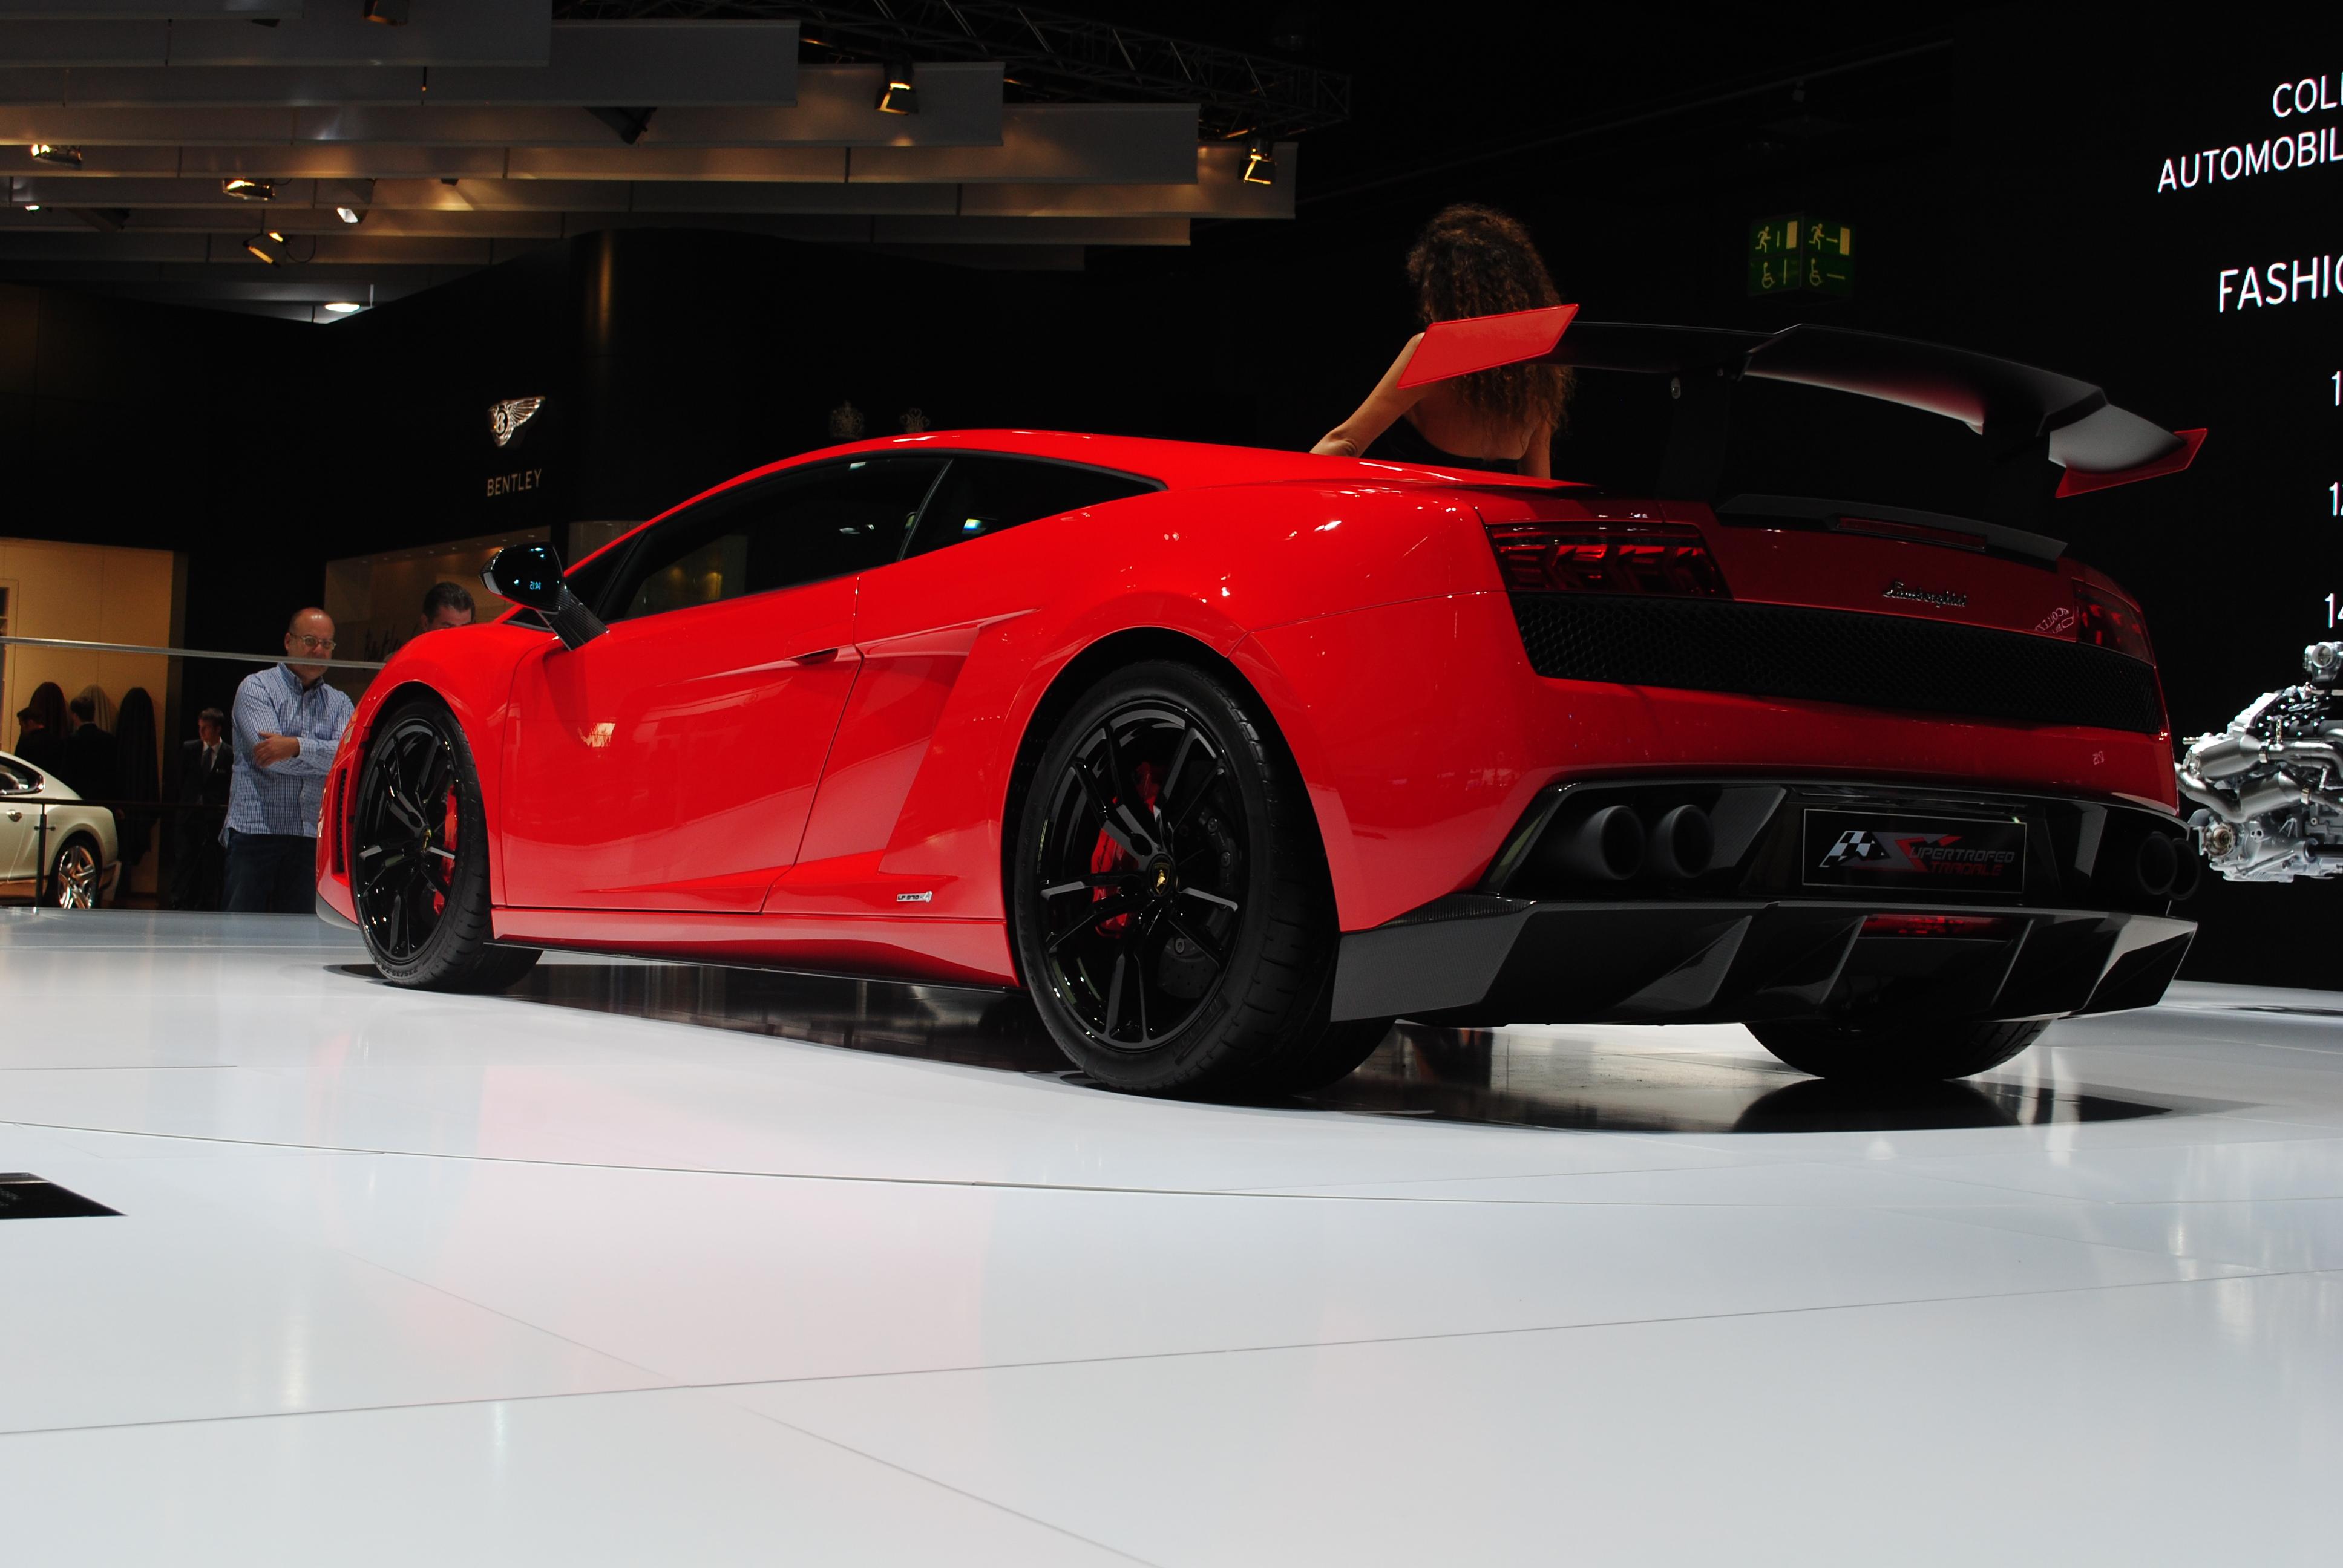 File Lamborghini Gallardo Lp 570 4 Super Trofeo Stradale 6147246324